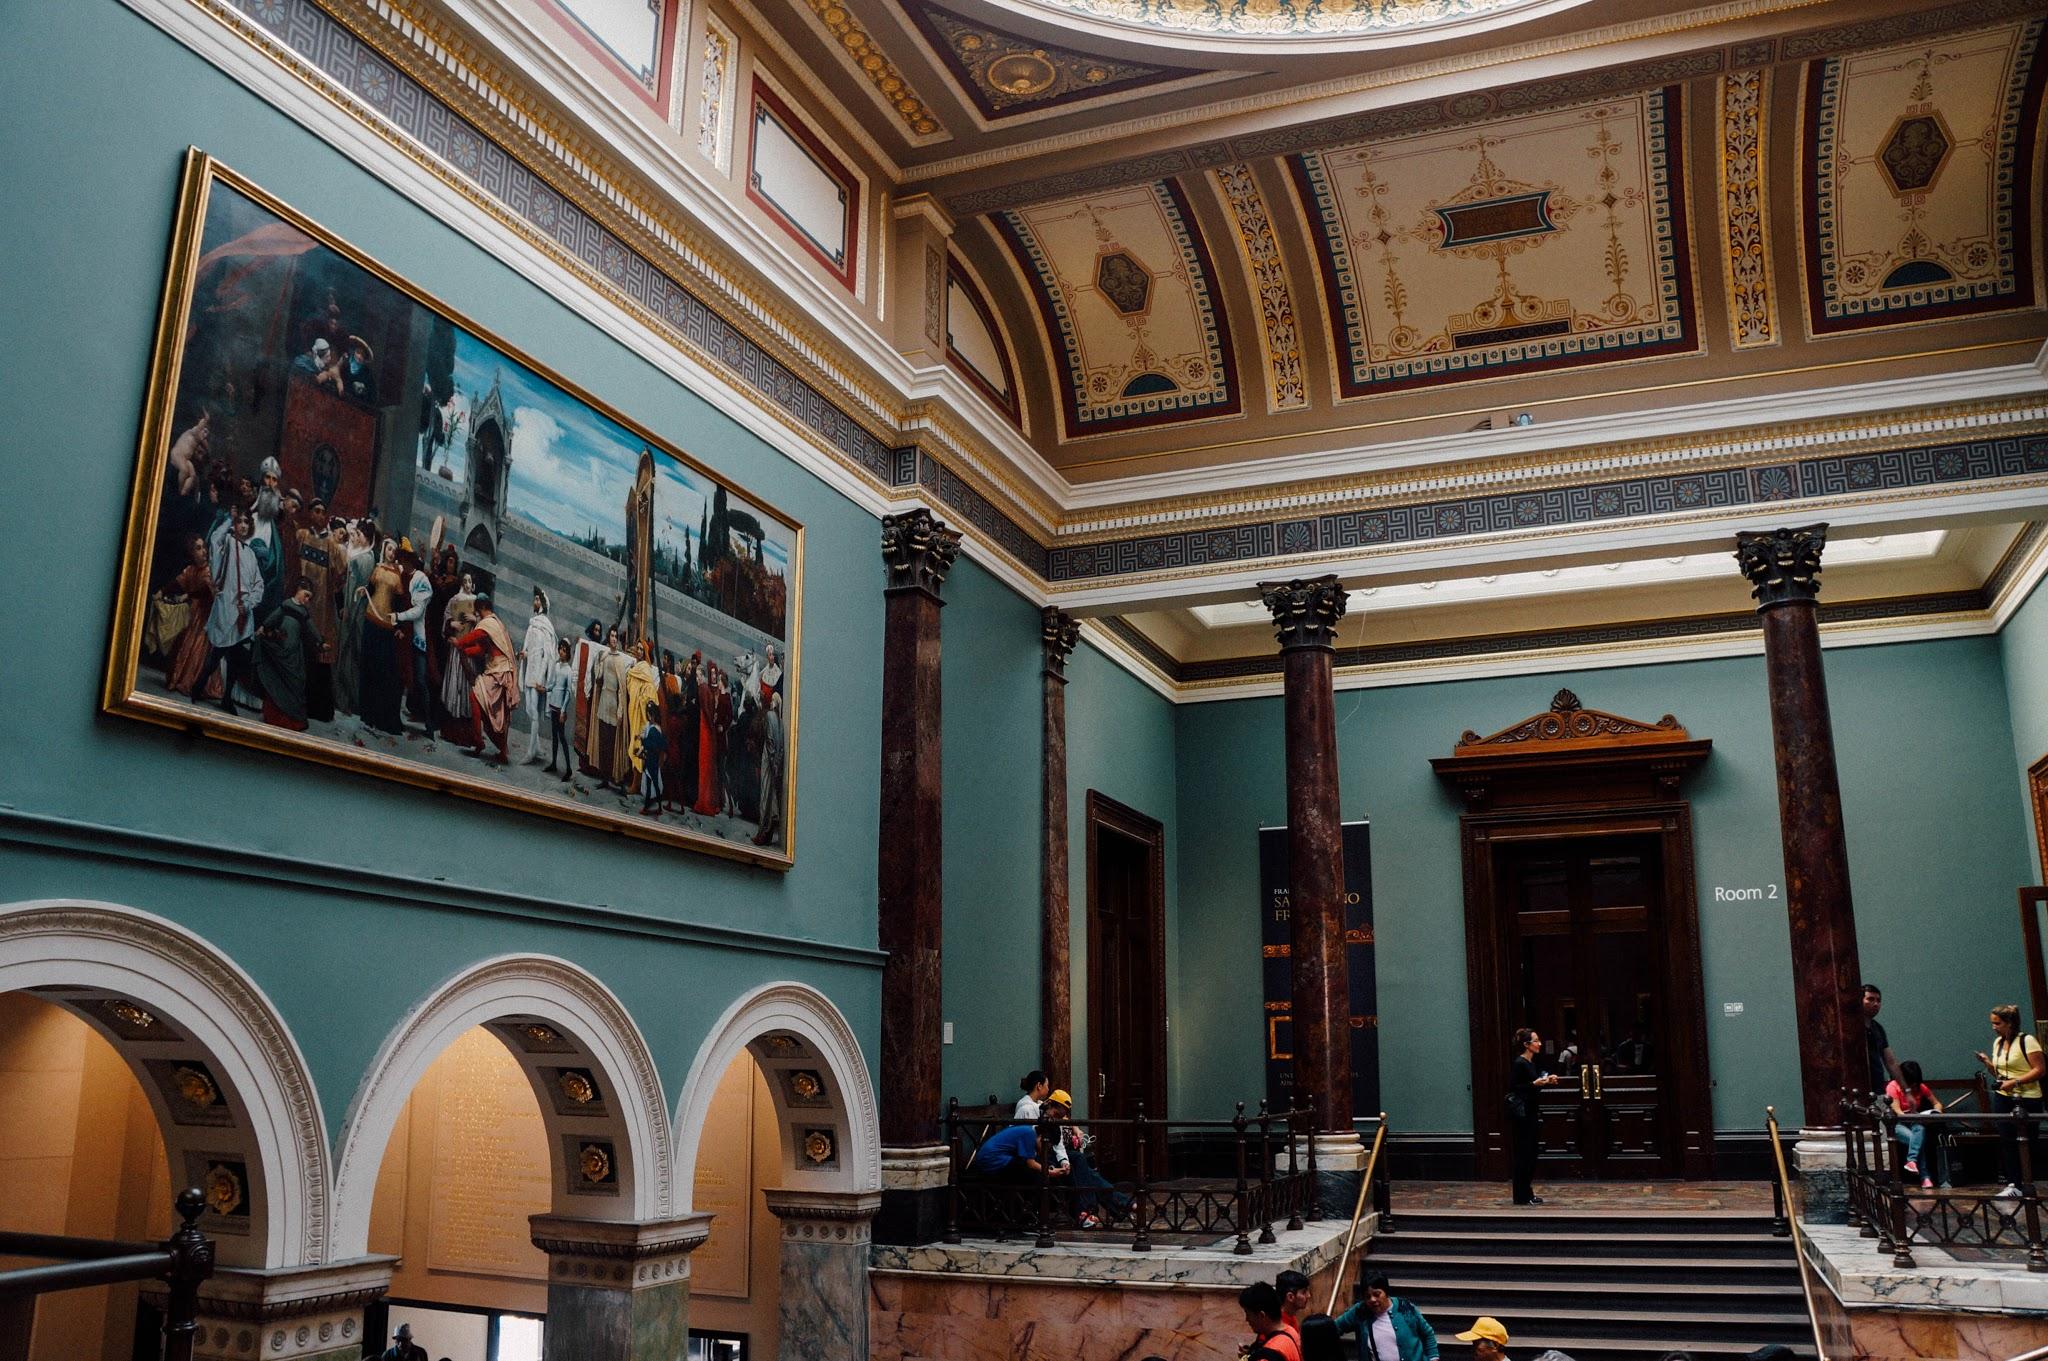 National Gallery London Trafalgar Square